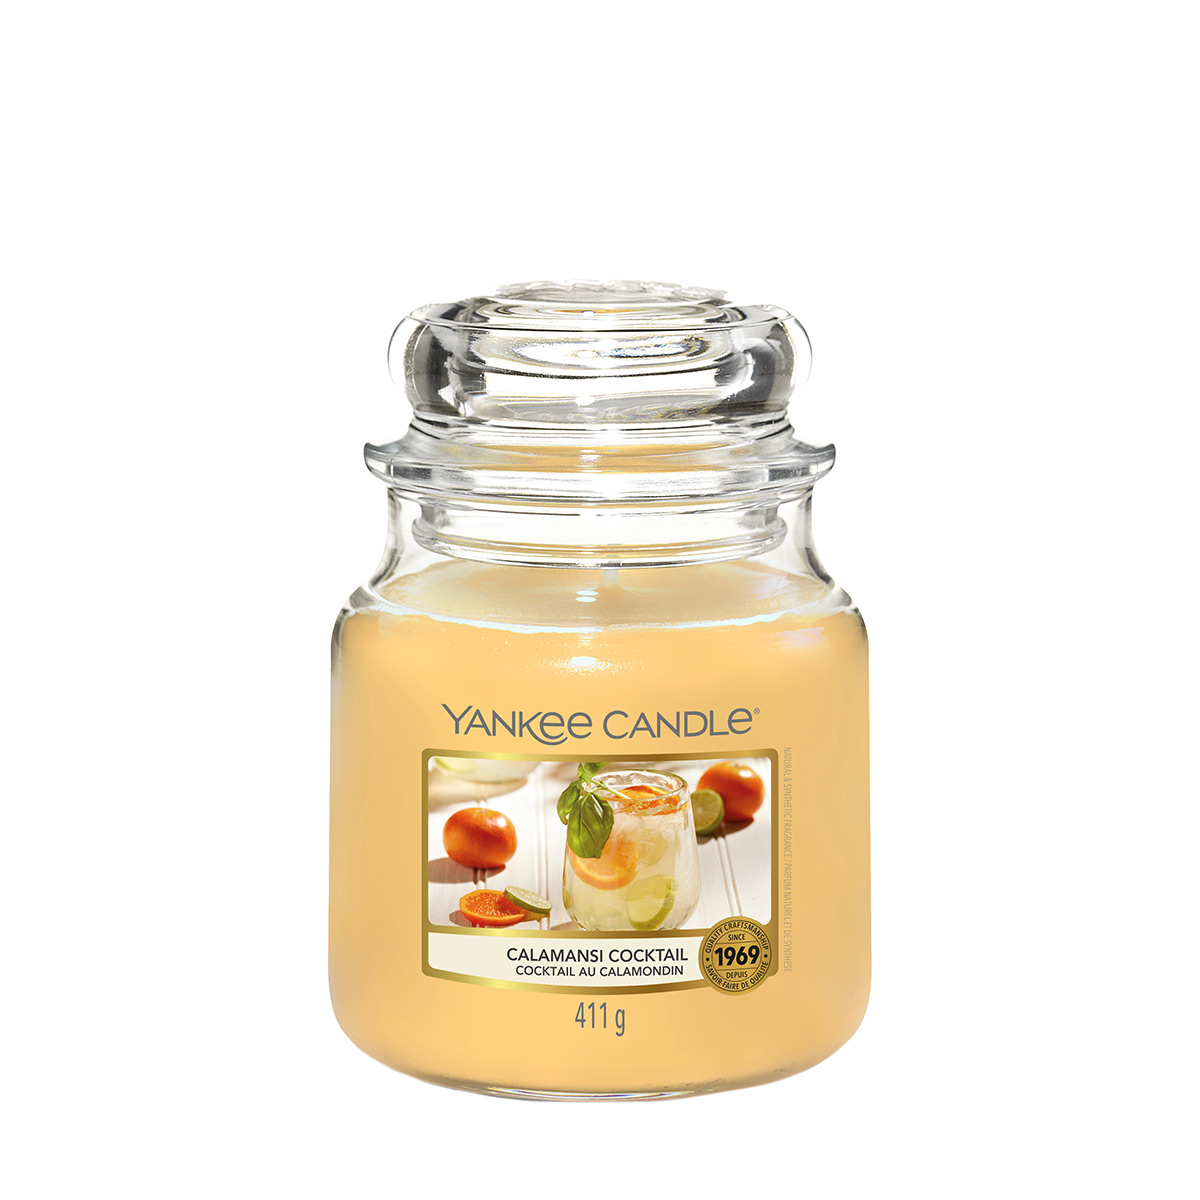 Calamansi-Cocktail-Medium-Classic-Jar